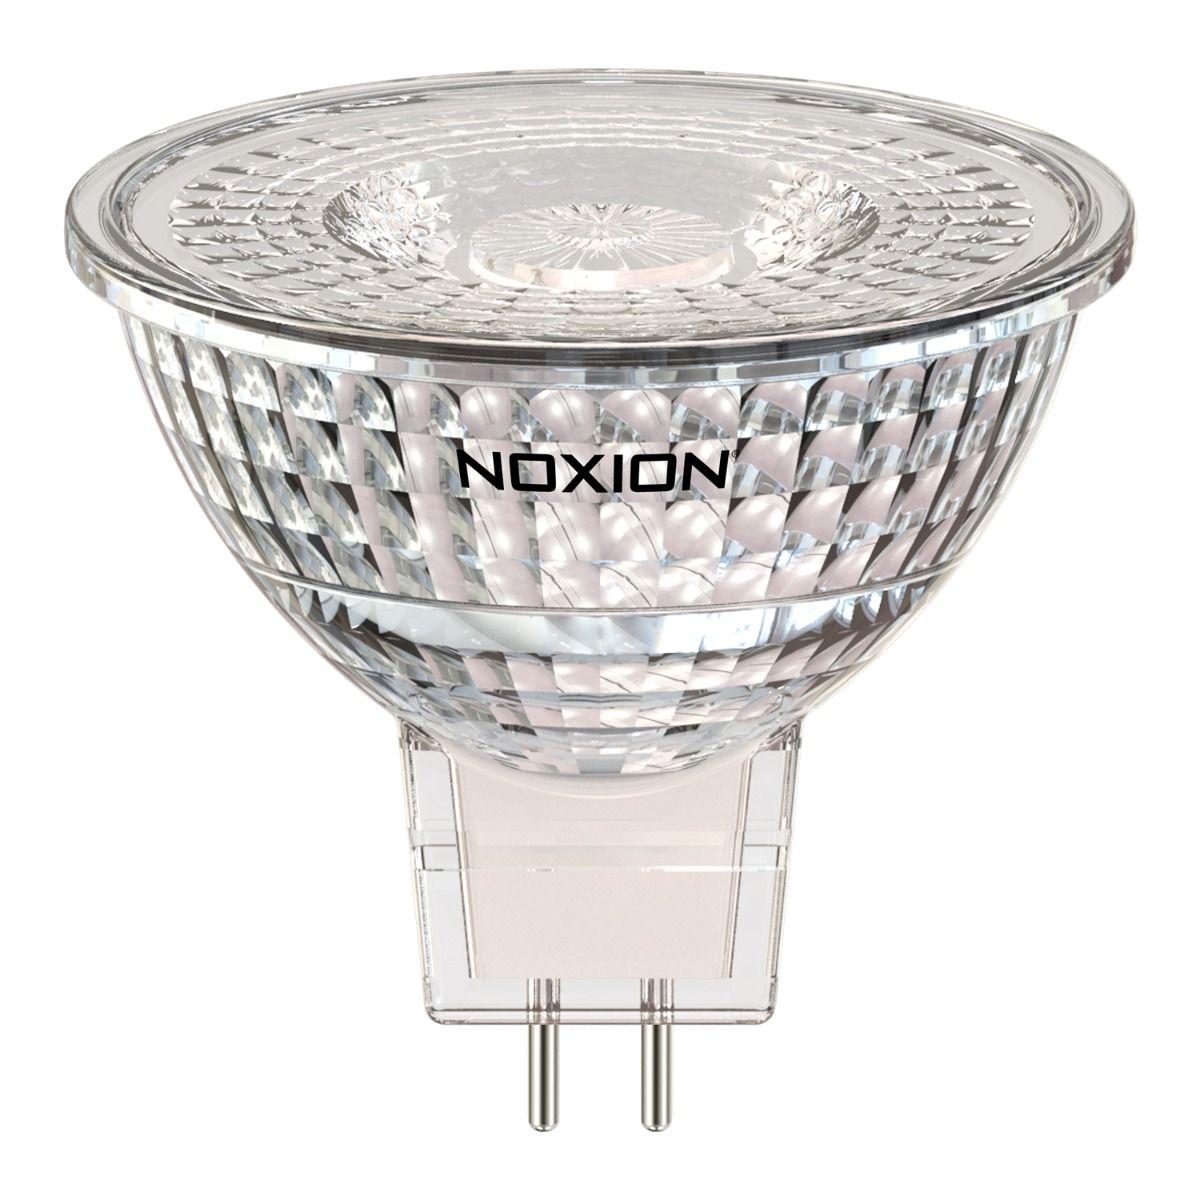 Noxion Spot LED GU5.3 5W 830 36D 470lm | Dimmable - Blanc Chaud - Substitut 35W